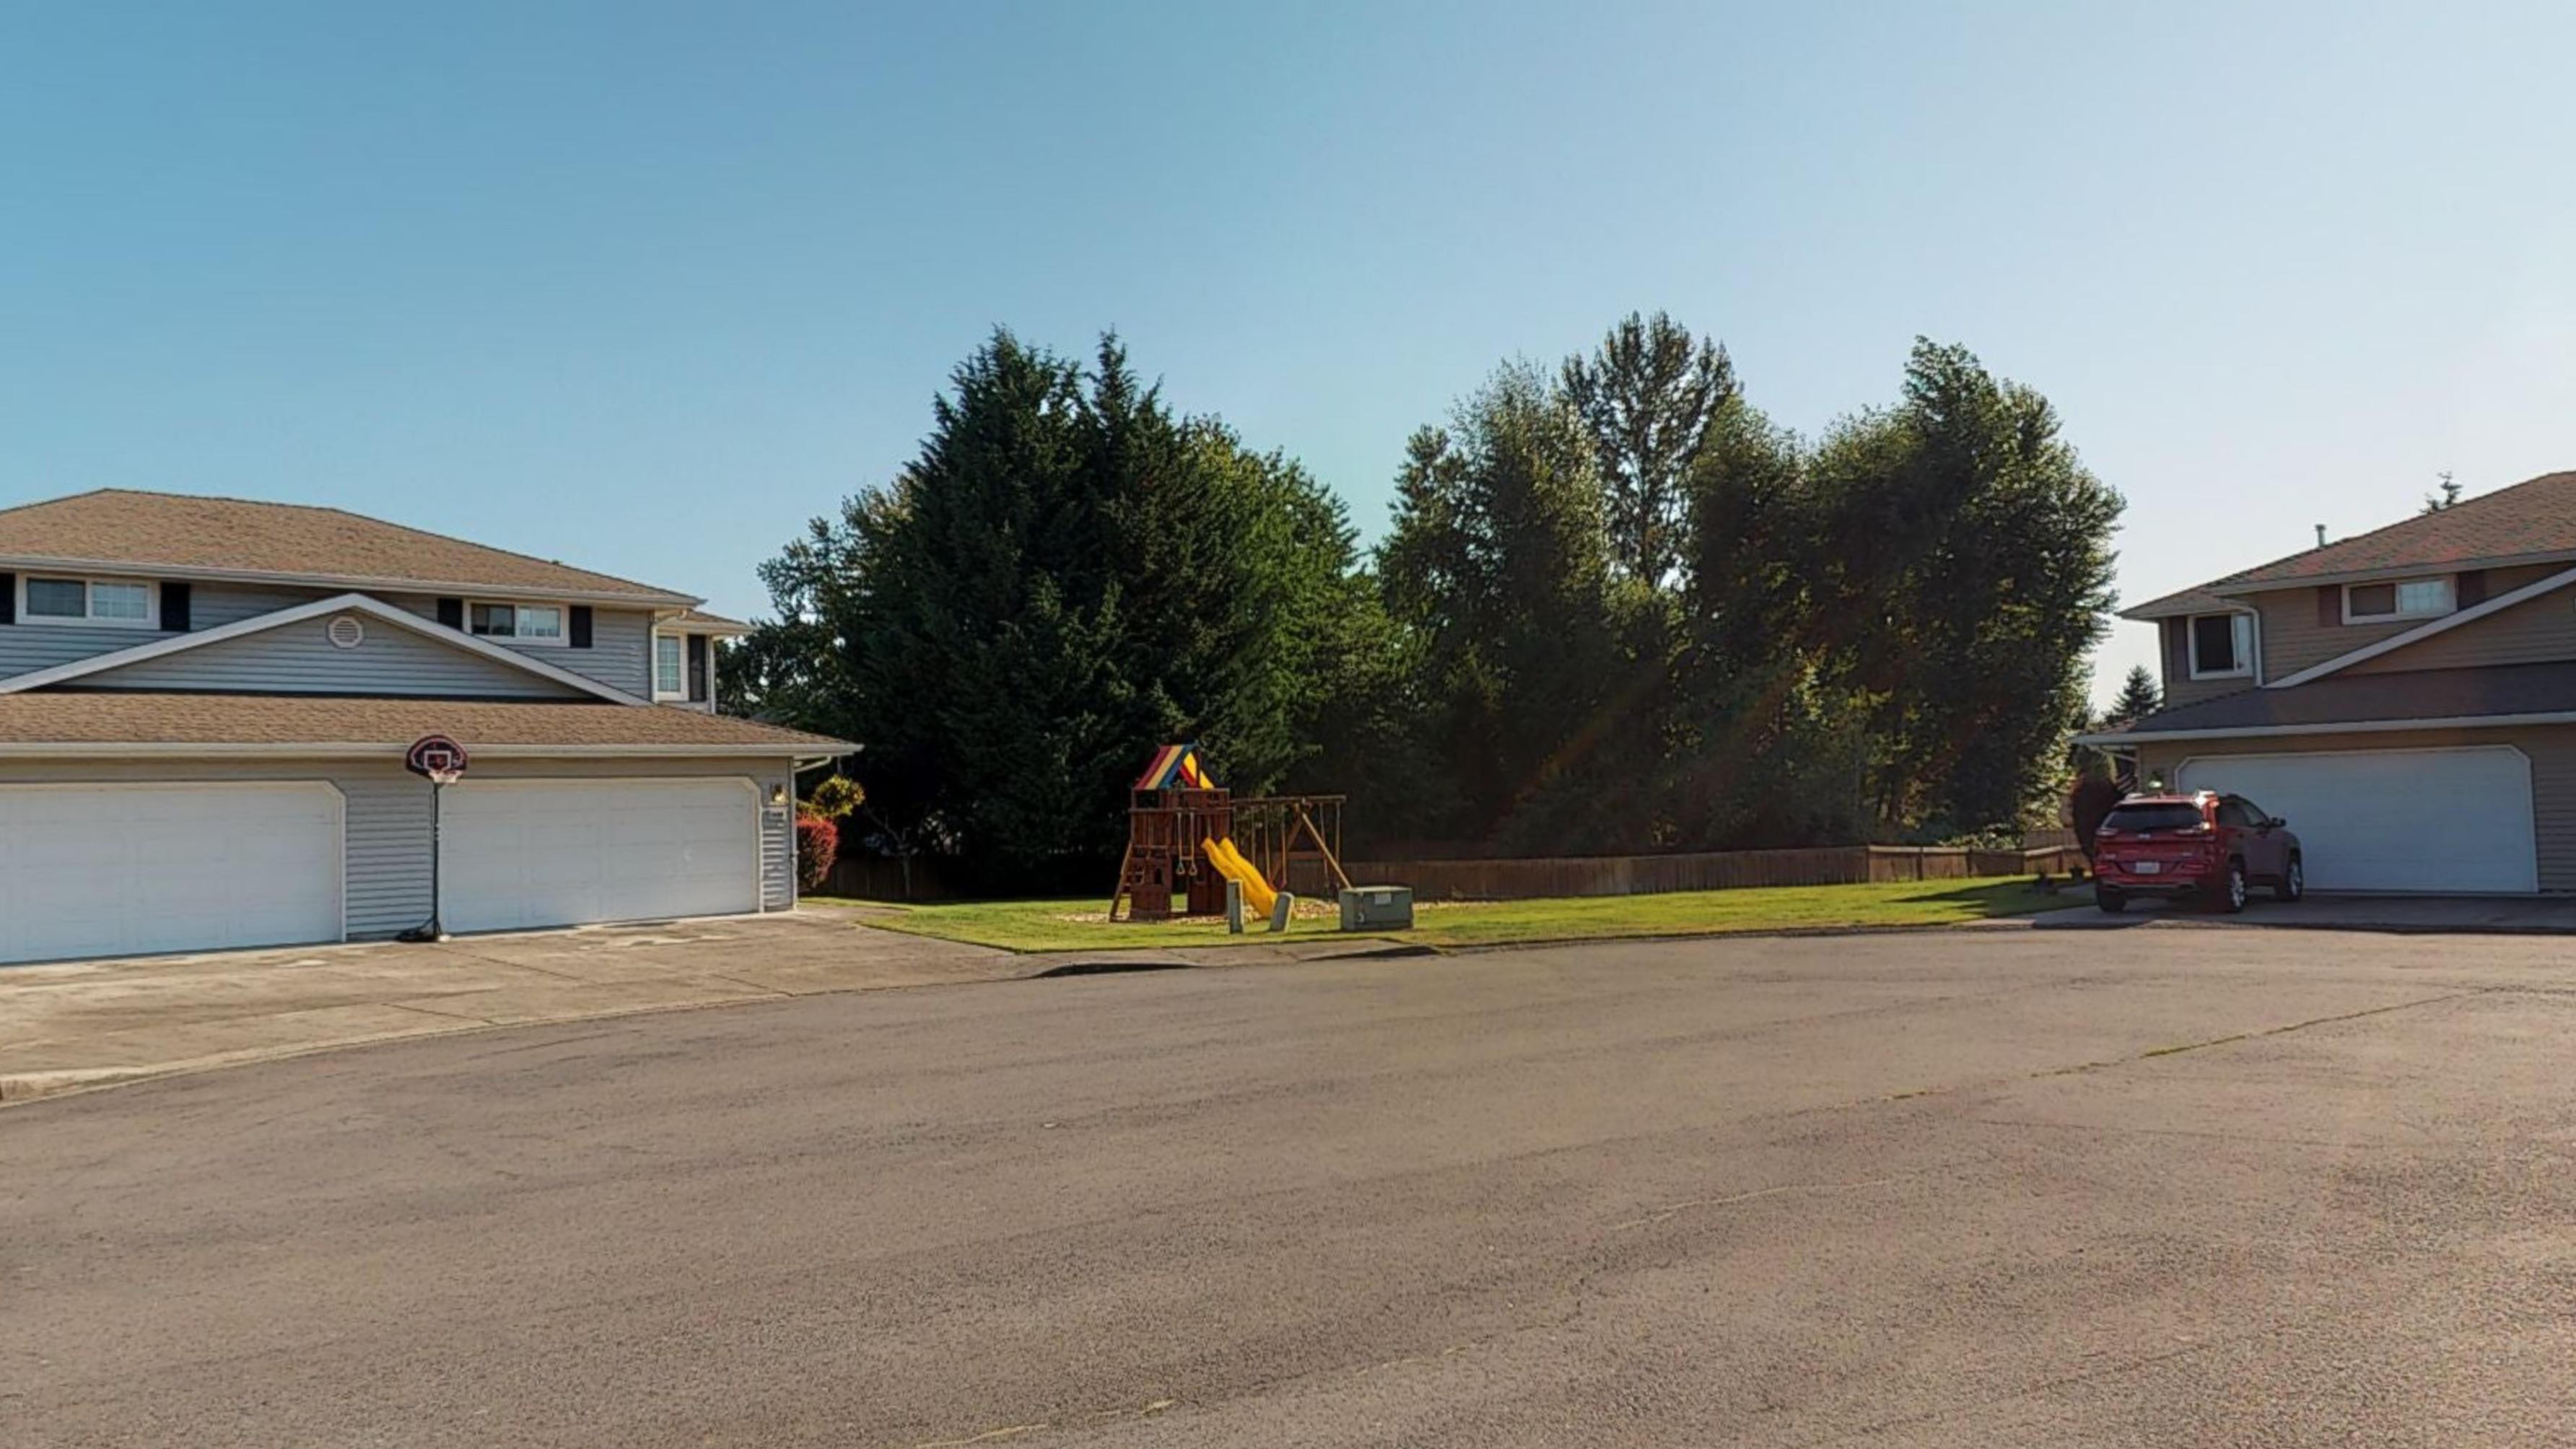 neighborhood playground/park